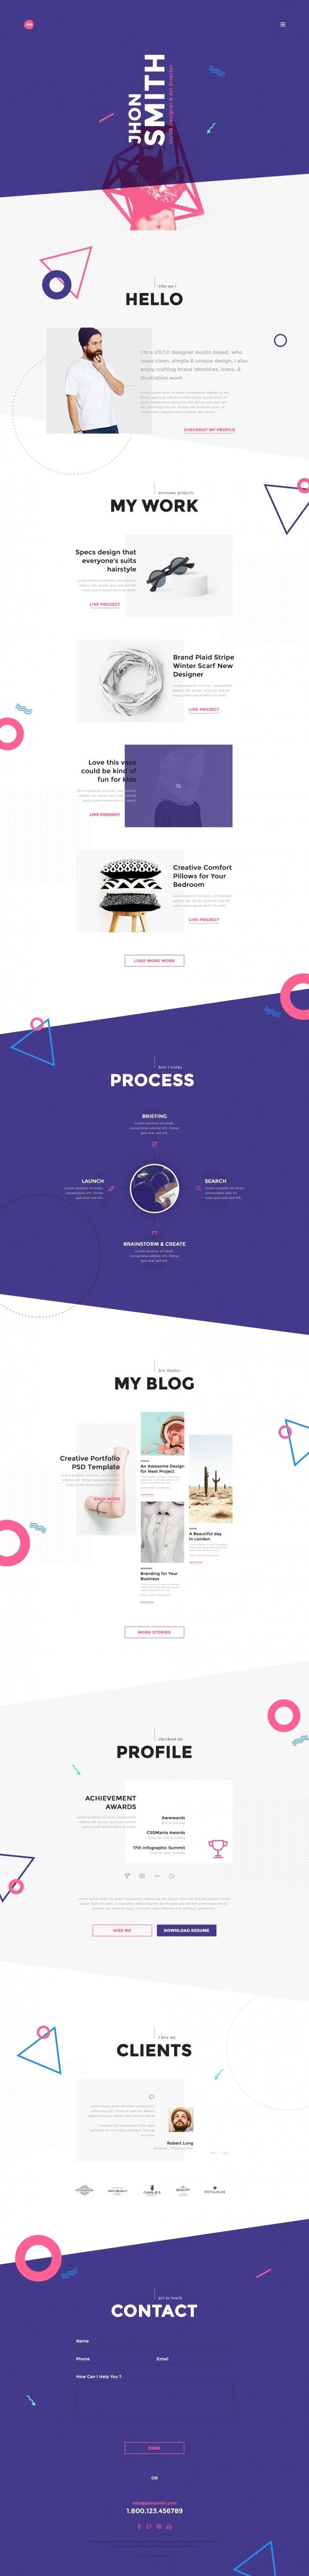 Me – Creative Portfolio & Resume / CV